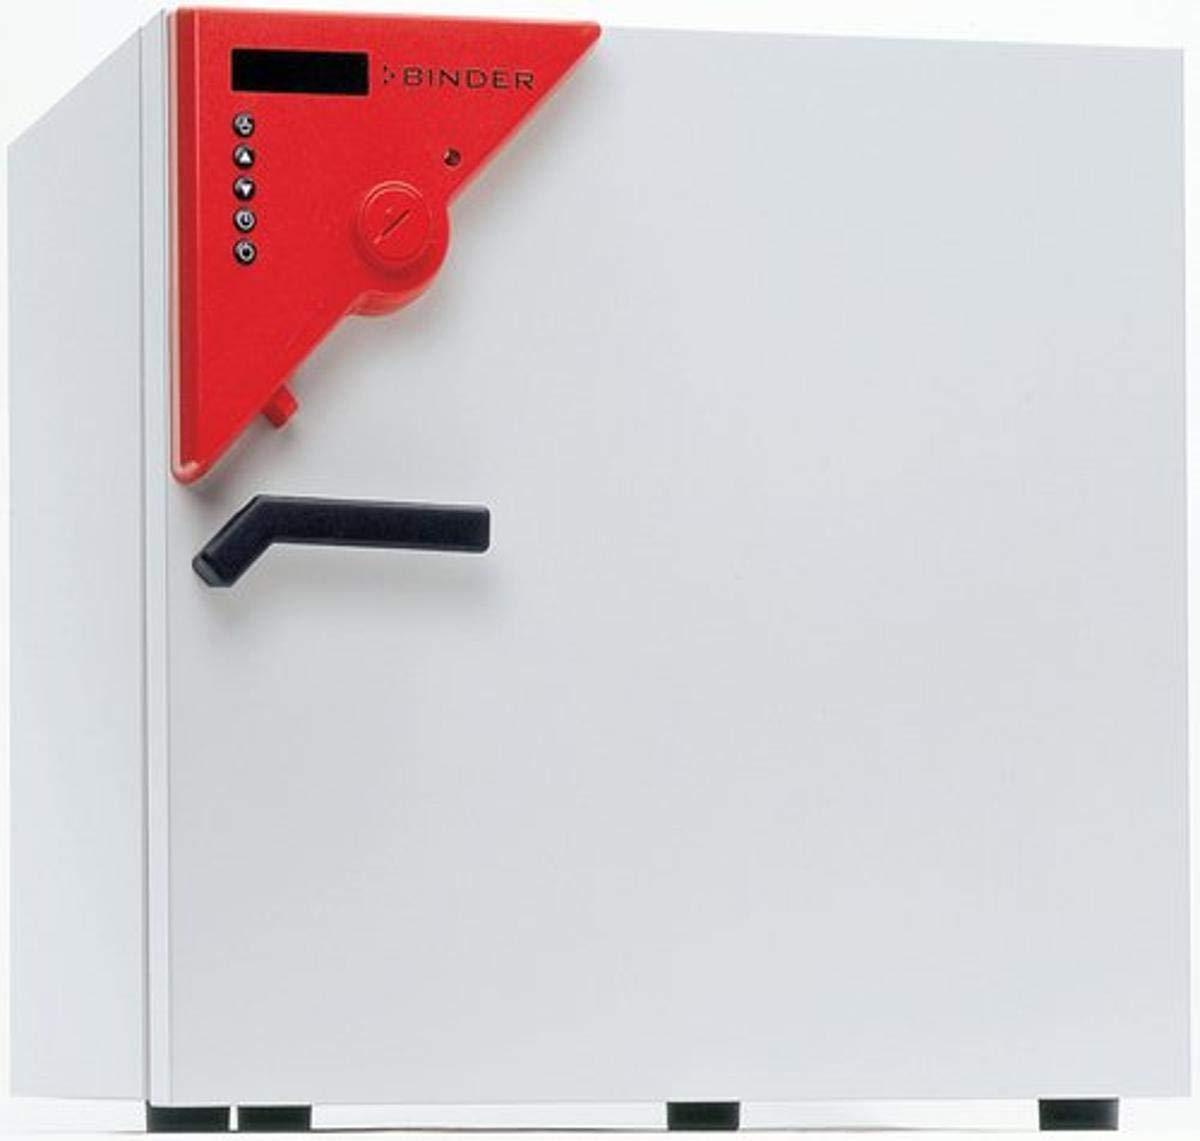 Binder Ed23 7182Z05EA Max 84% OFF Oven W 230V Super popular specialty store Strlzr Rs422